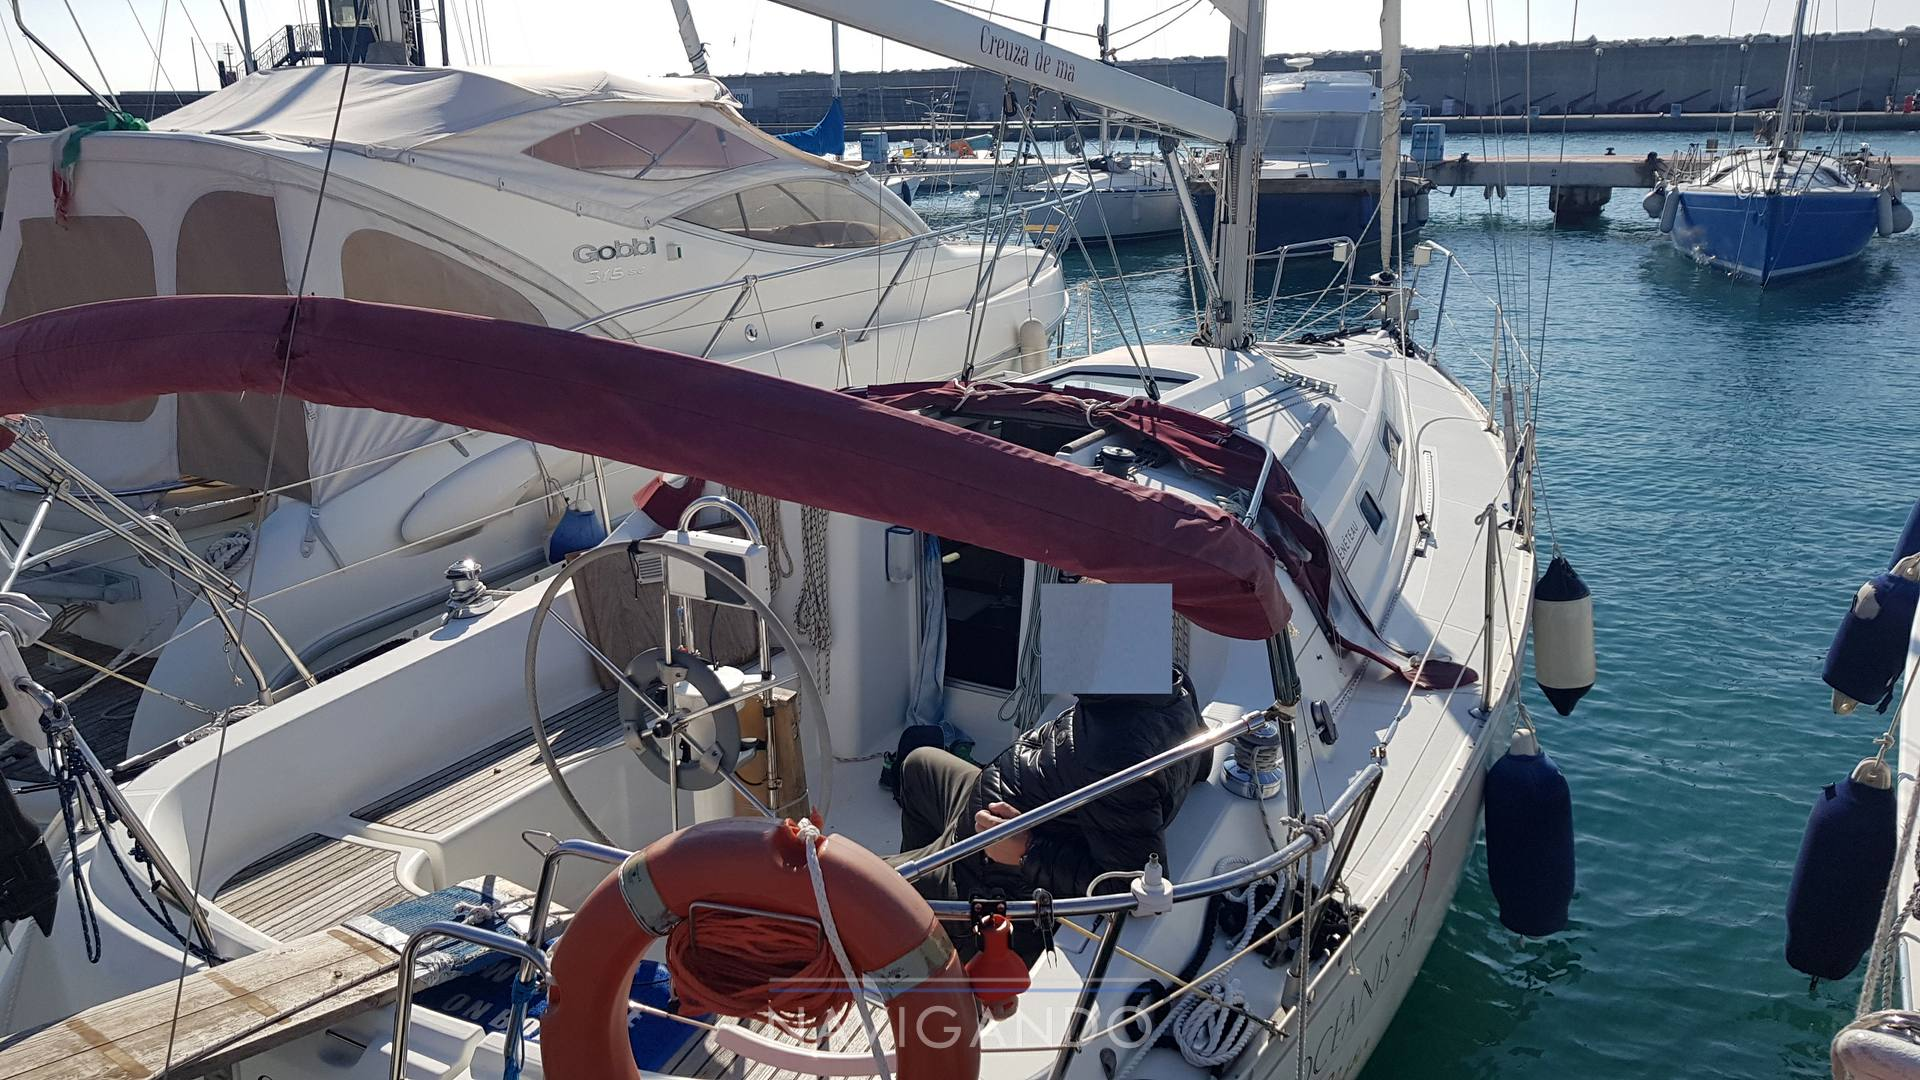 Beneteau Oceanis 311 sailing boat